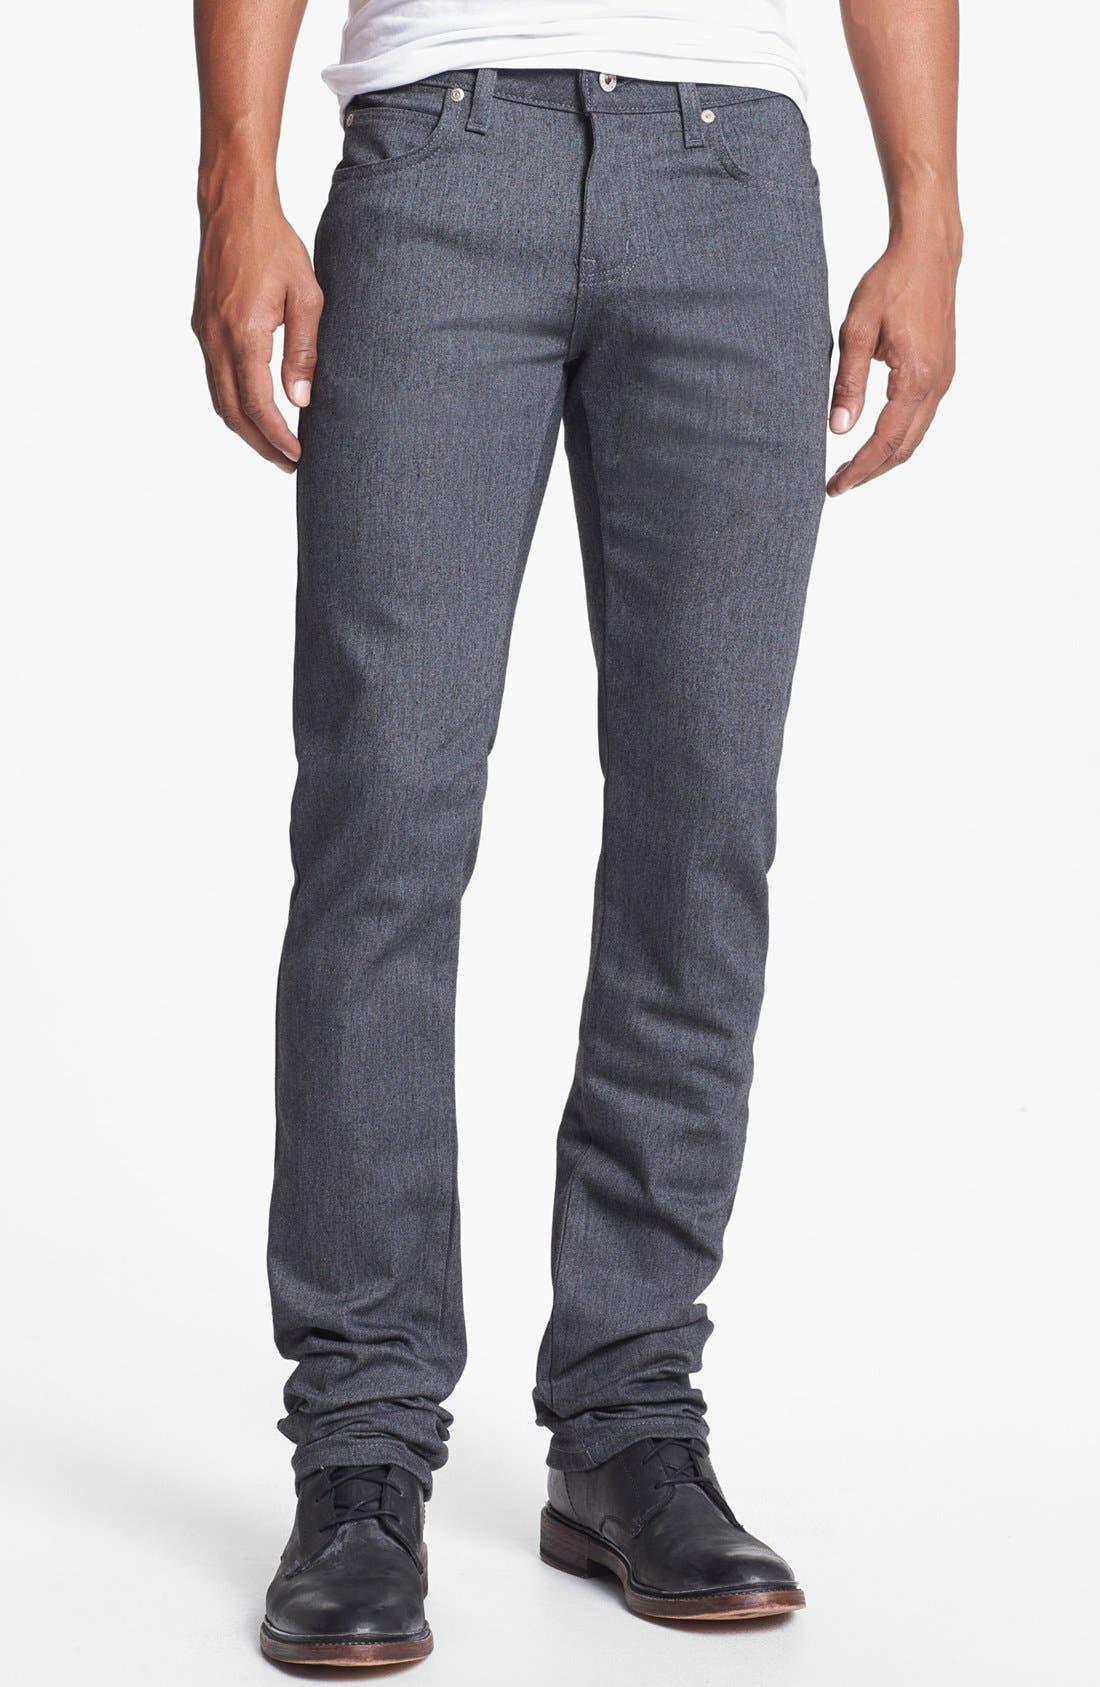 Alternate Image 2  - Naked & Famous Denim 'Skinny Guy' Skinny Fit Jeans (Heather Grey Stretch)